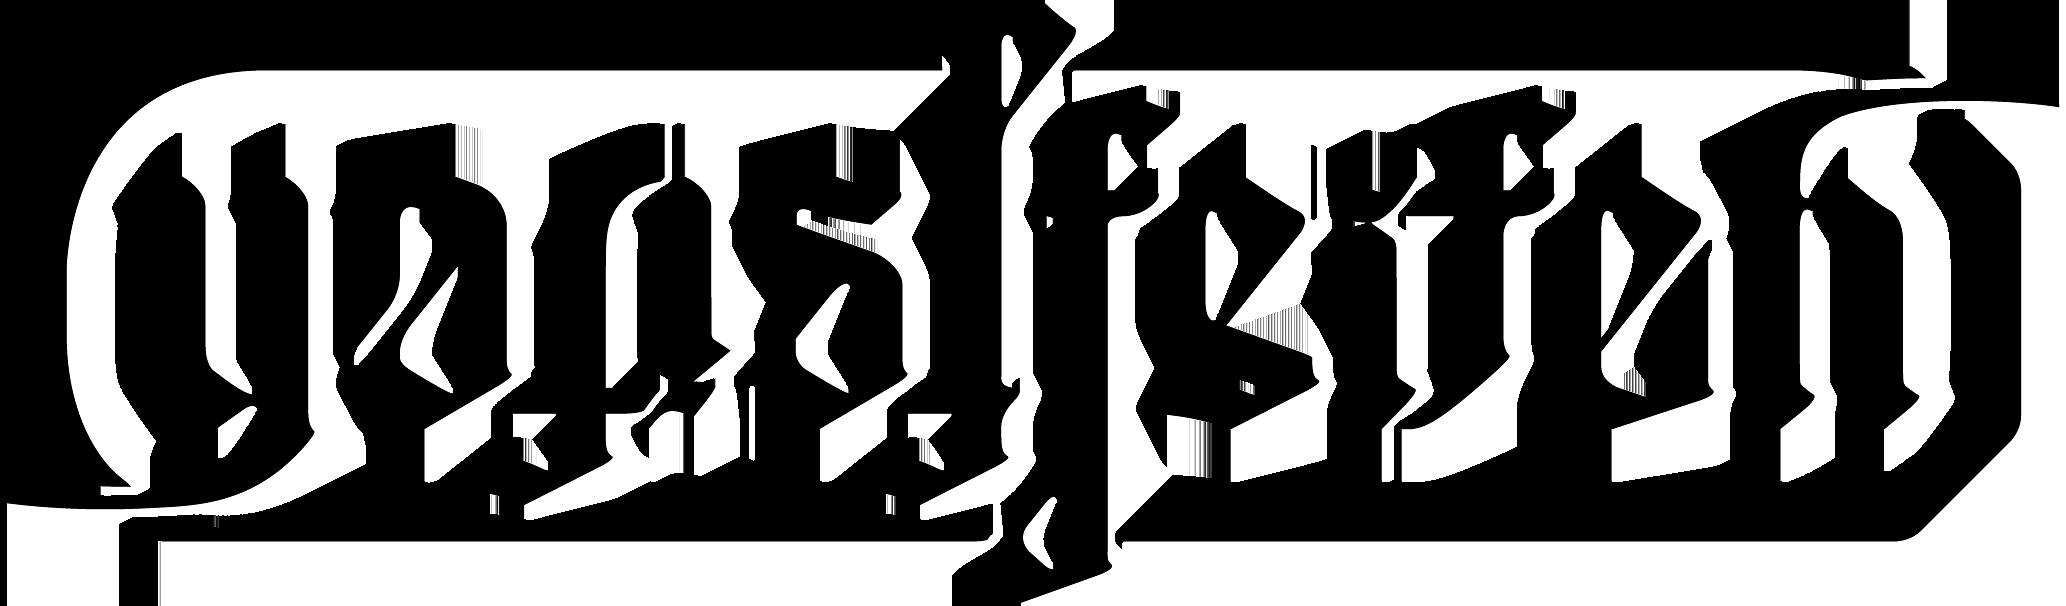 Yogs-Pfeifen-Logo